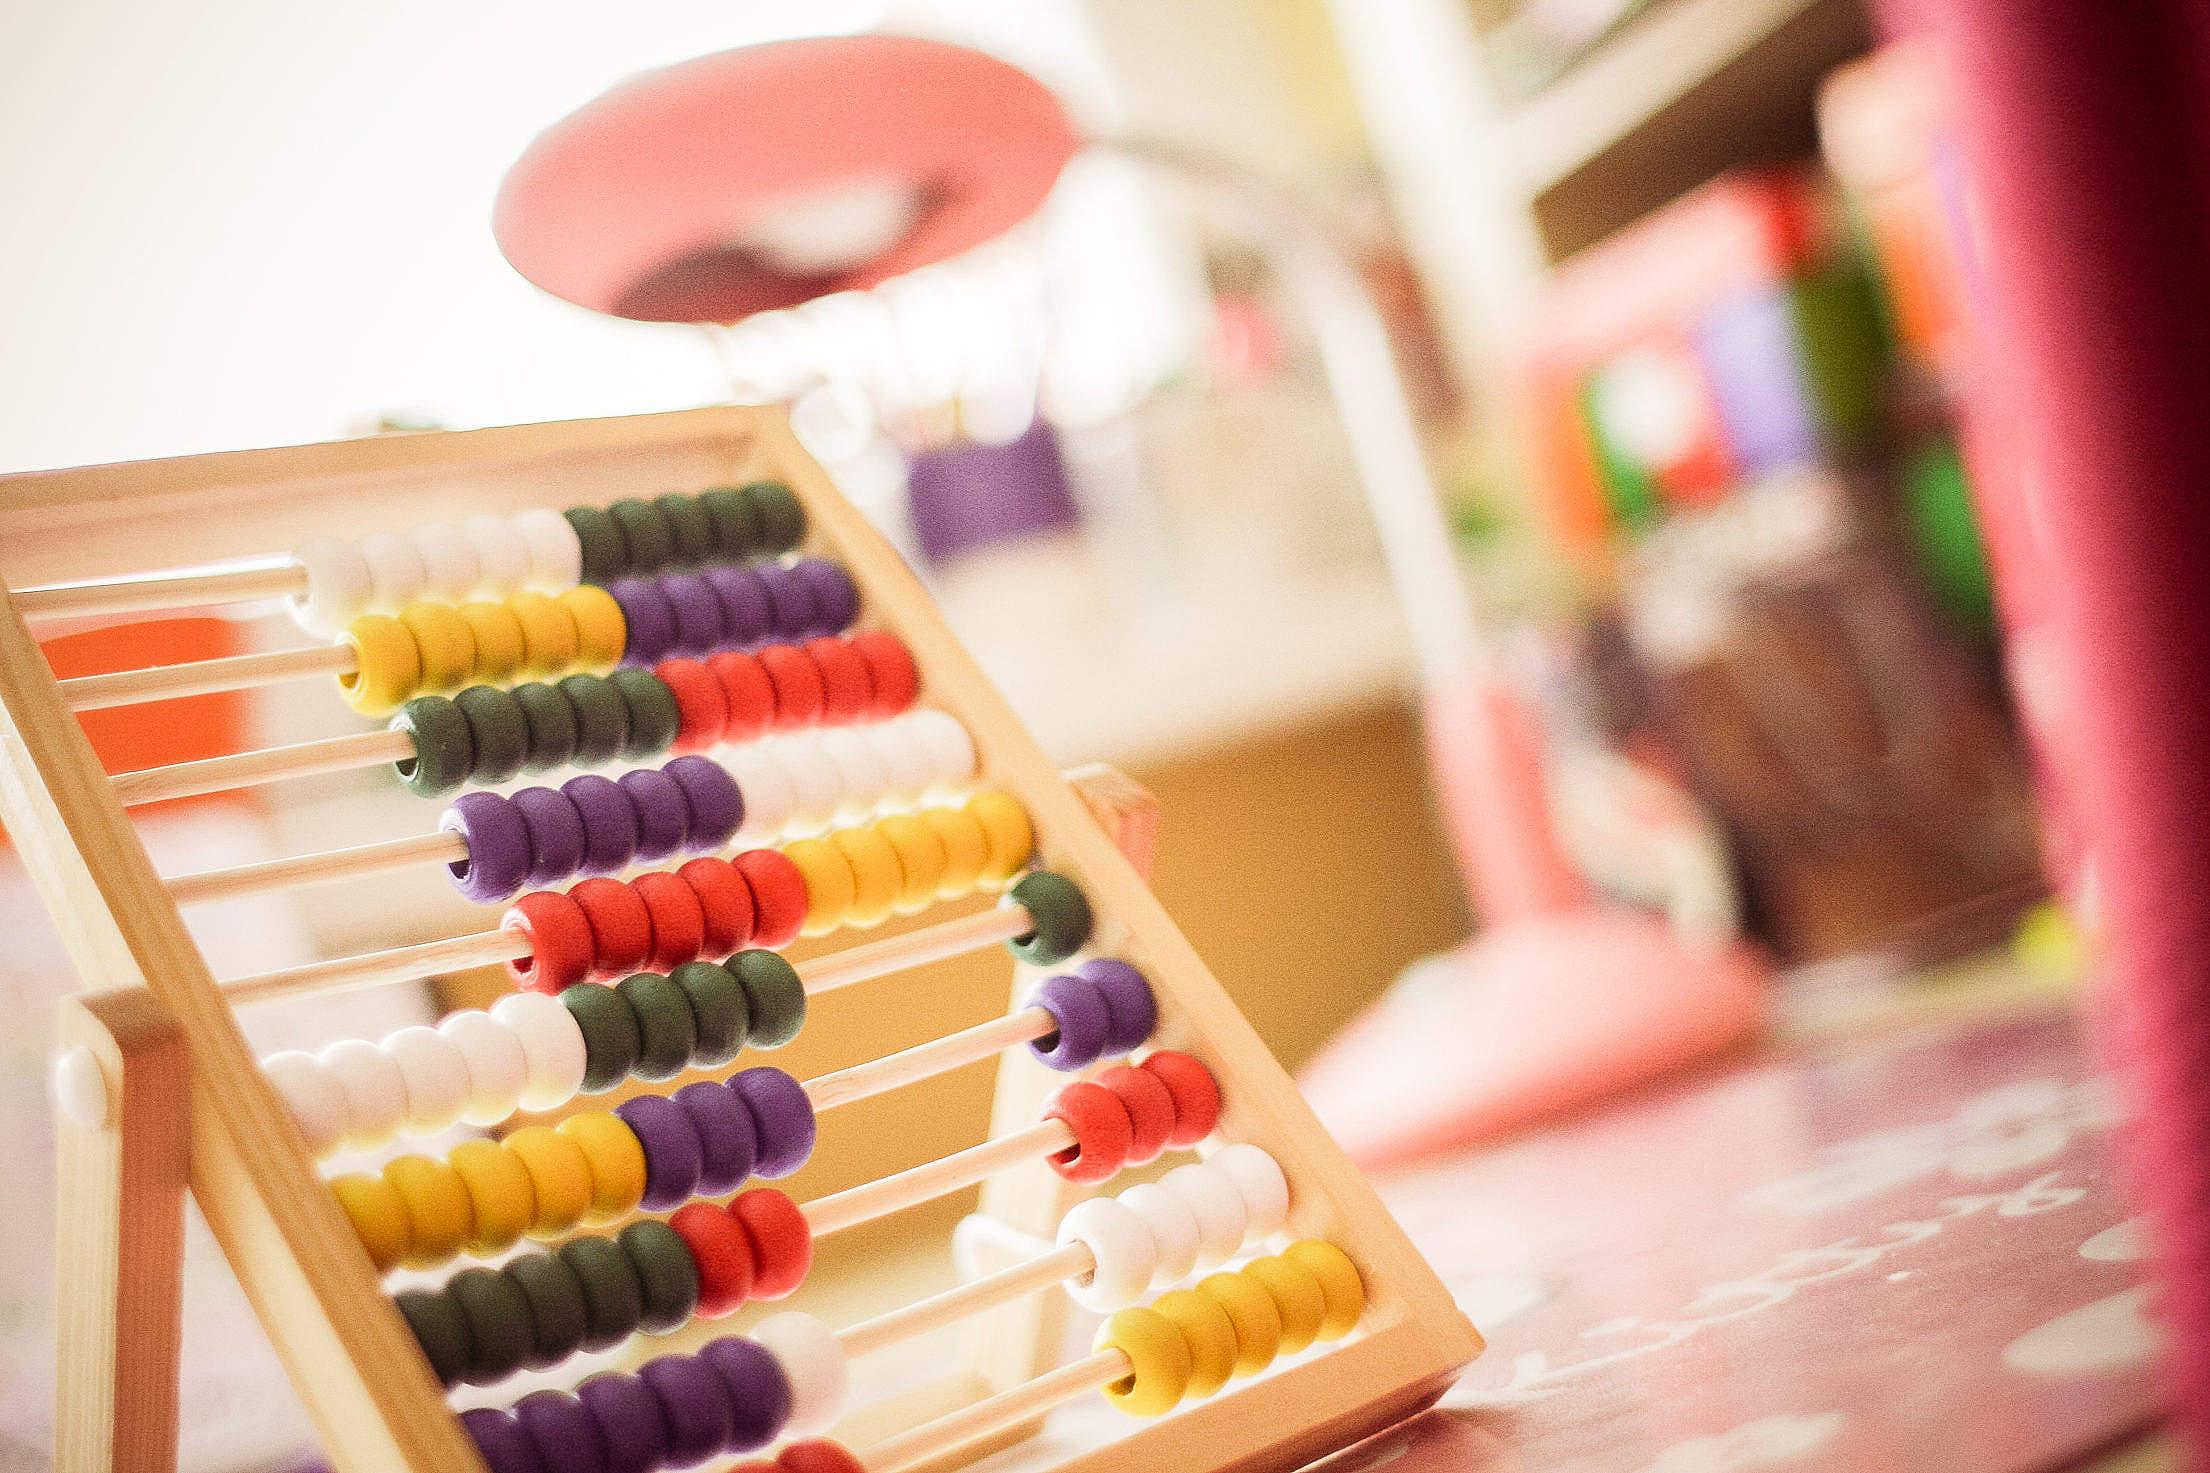 childrens-wooden-abacus_free_stock_photos_picjumbo_IMG_6772-2210x1473.jpg